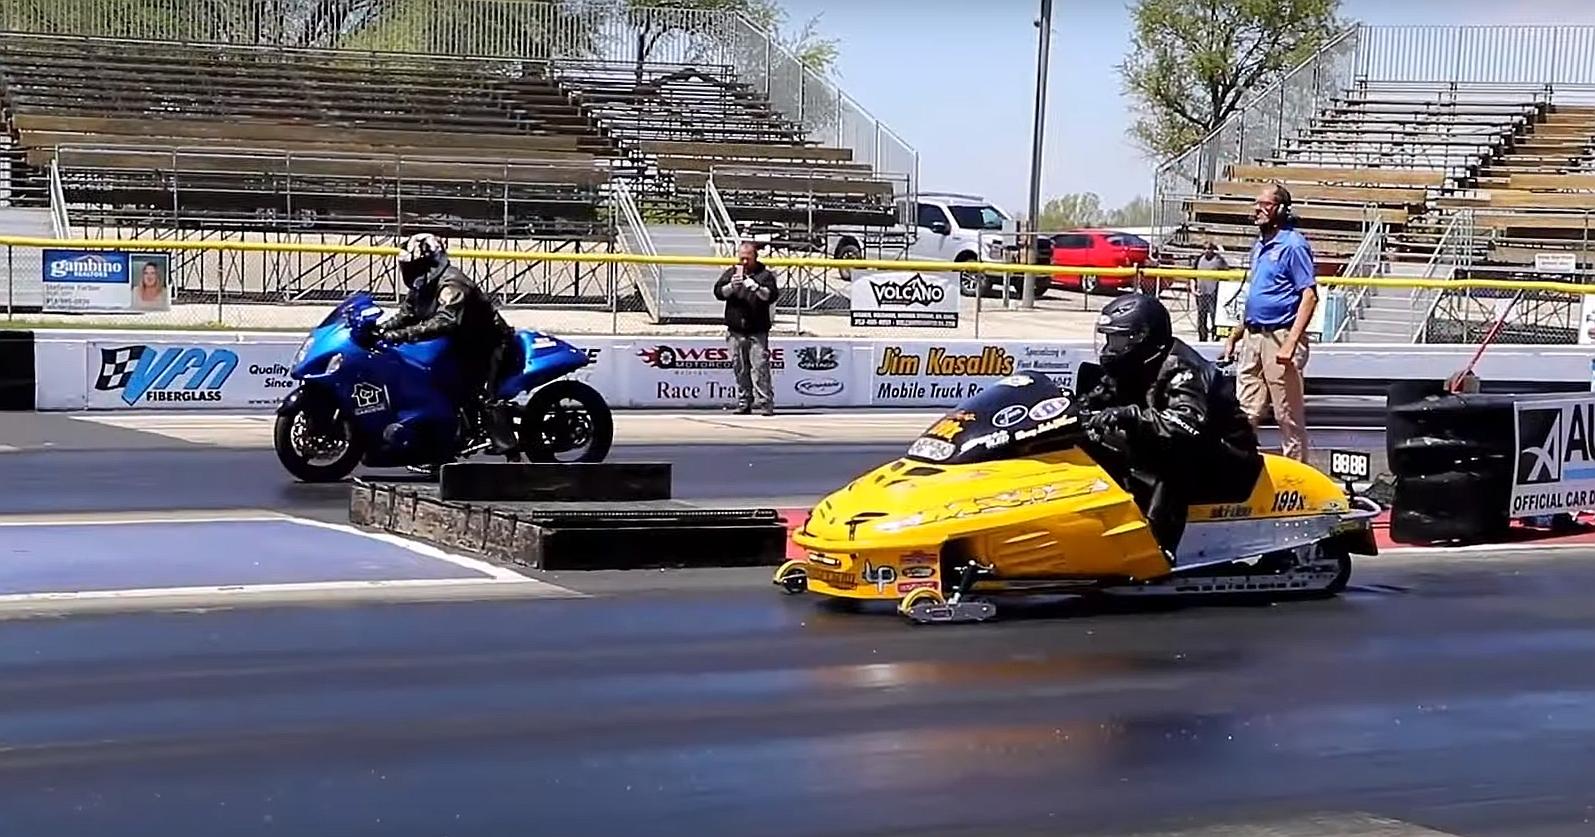 Suzuki Hayabusa vs Snowmobile Is a Weird and Fun Drag Race